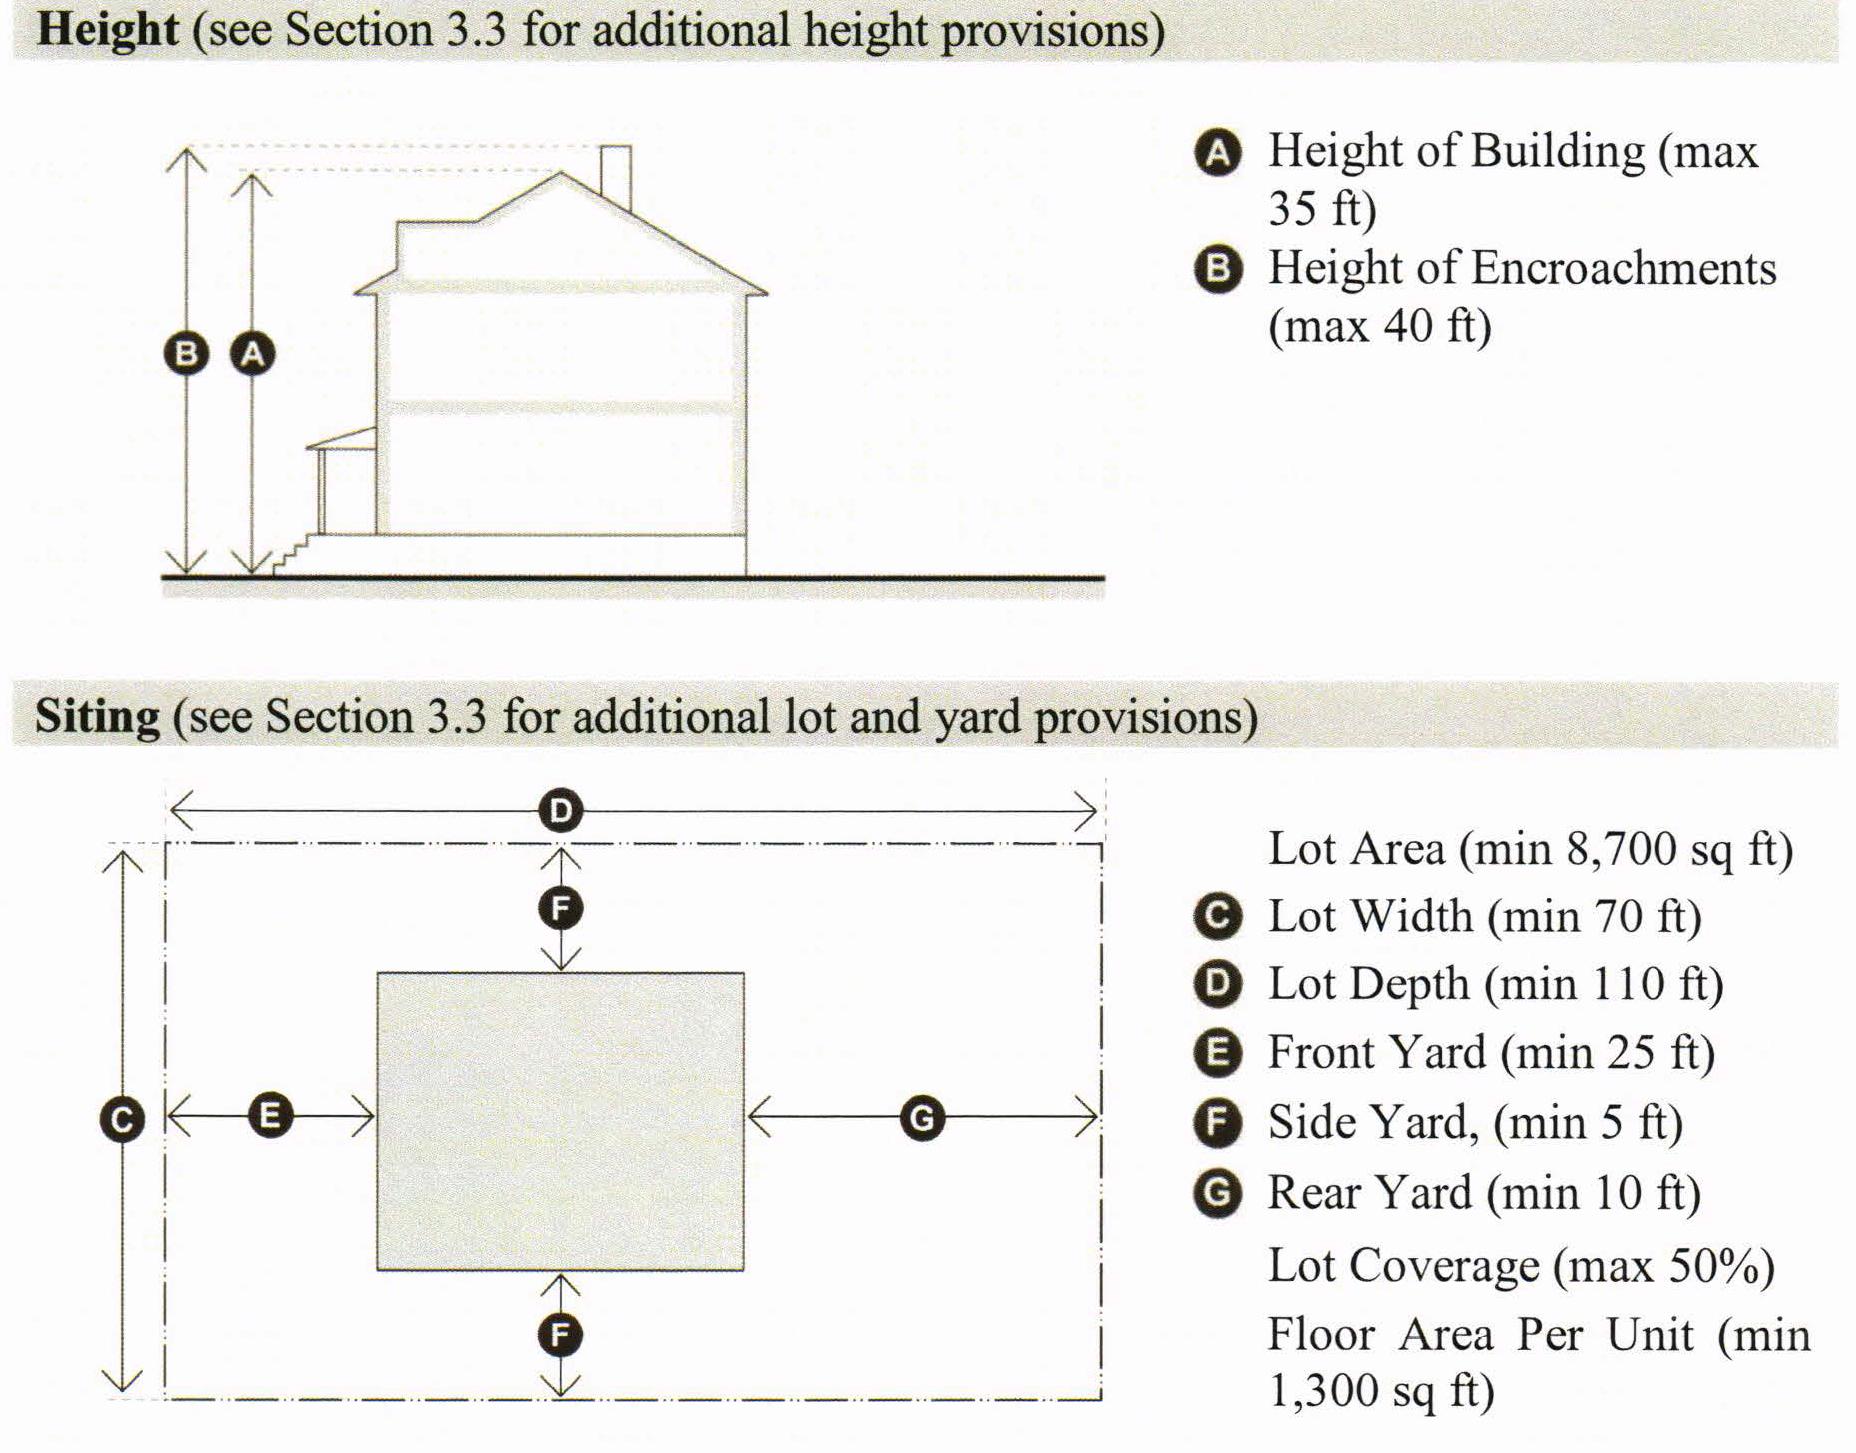 434 Wiring Diagram 700 434 Gas Valve | Wiring LibraryWiring Library